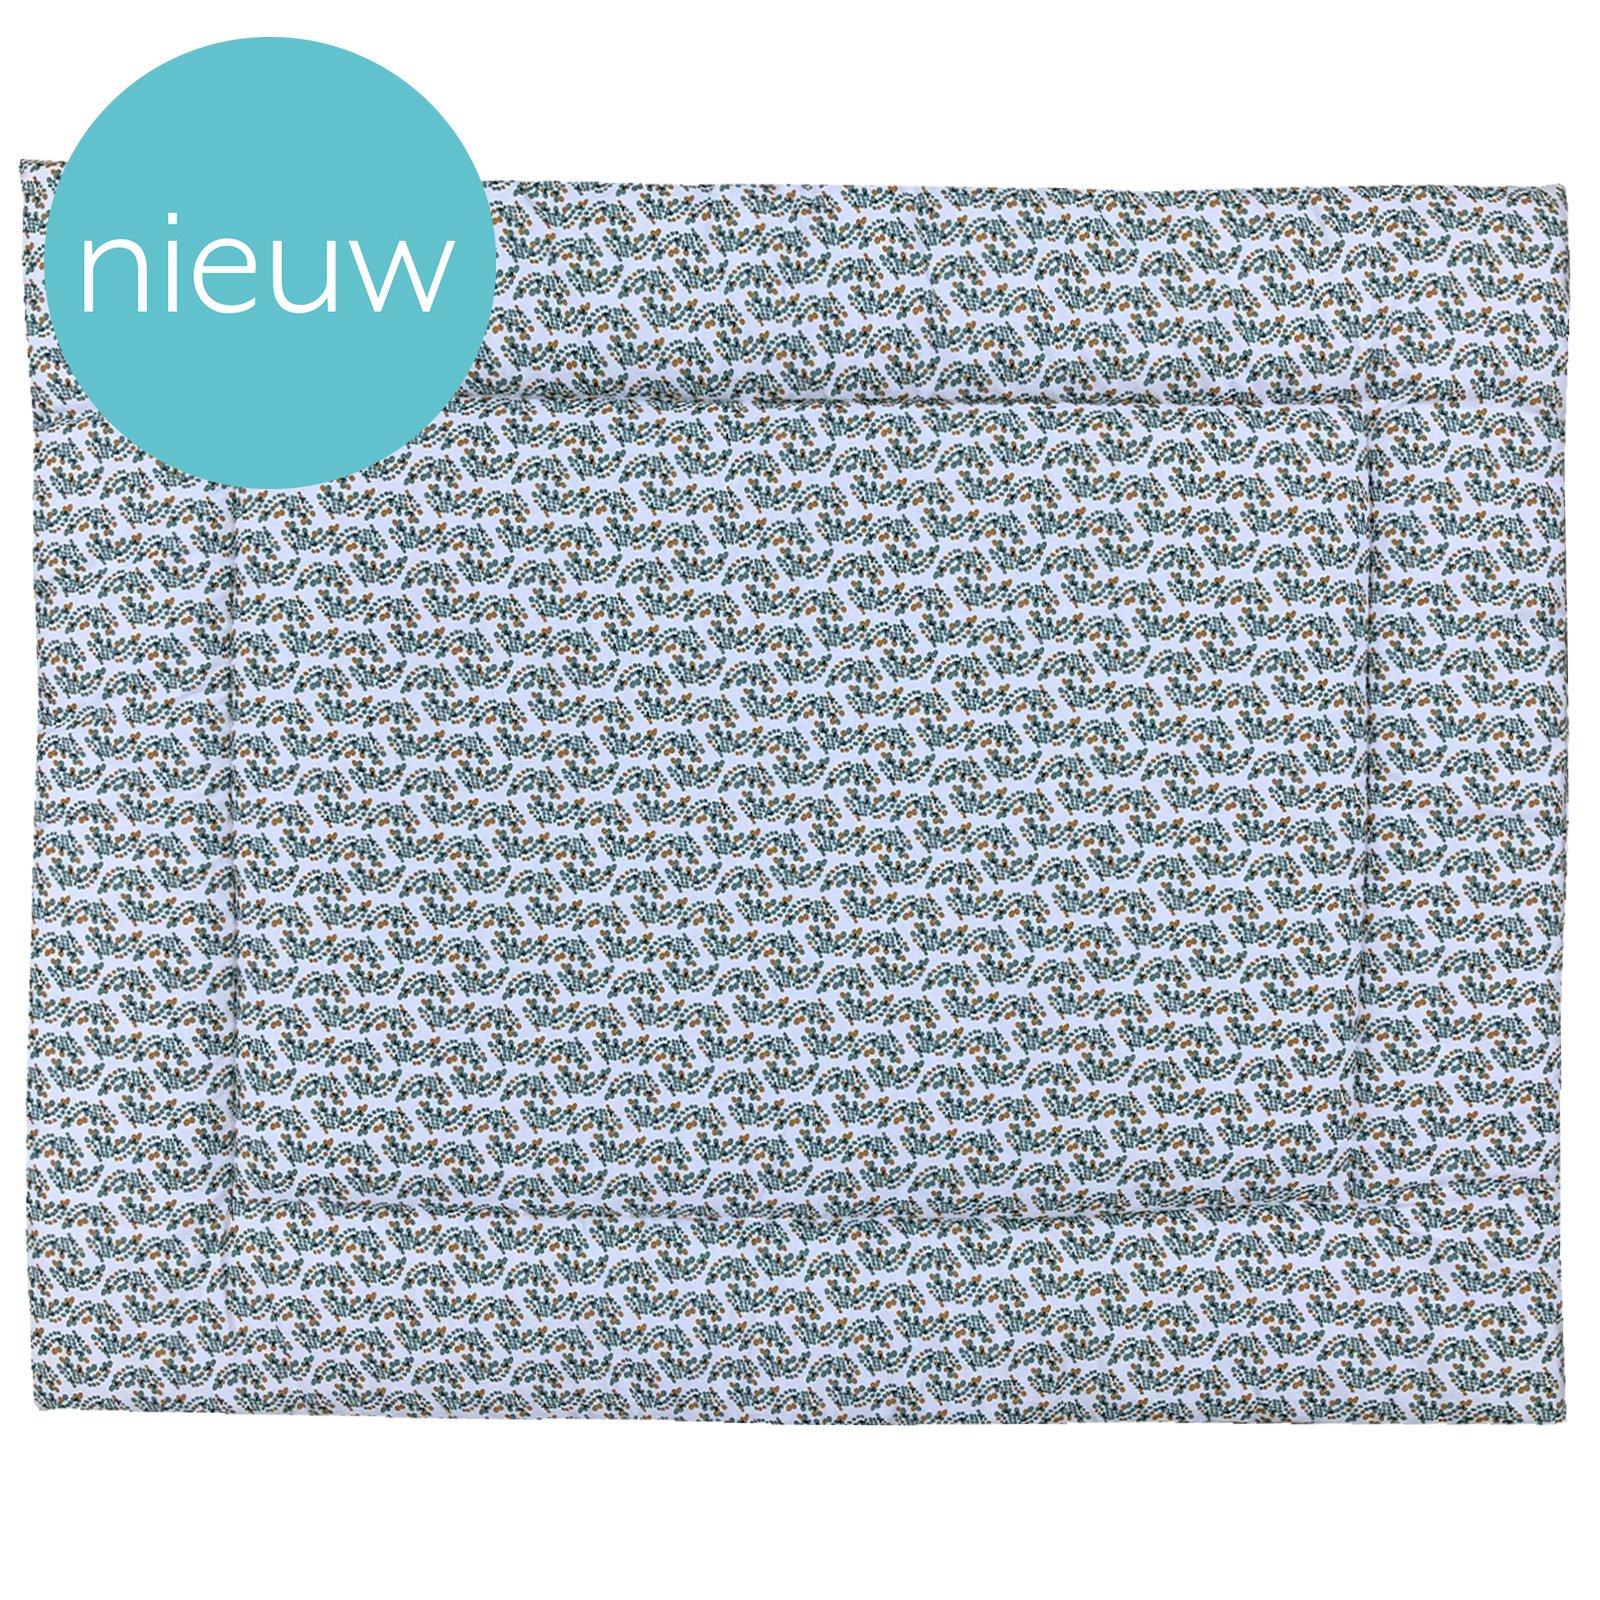 Boxkleed Spots off white ondergrond met stippenprint in mosterdgeel, zeegroen en donkerblauw